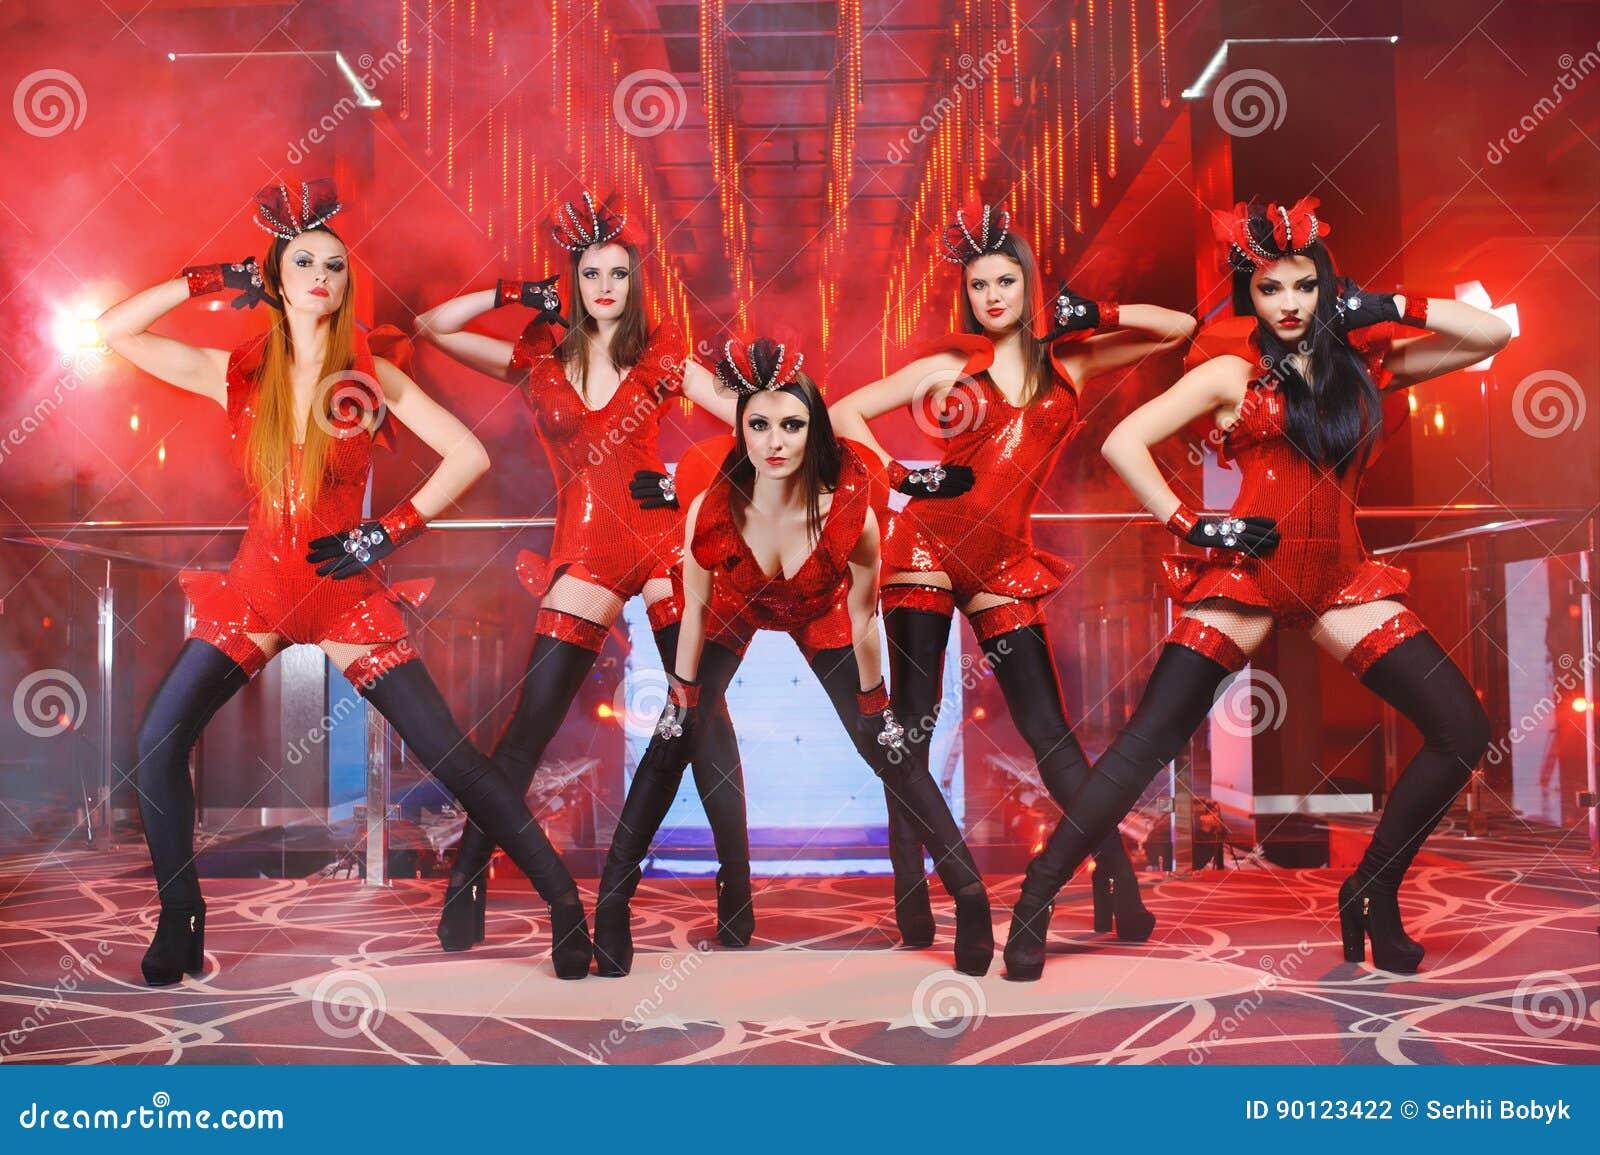 Exotic erotic dance